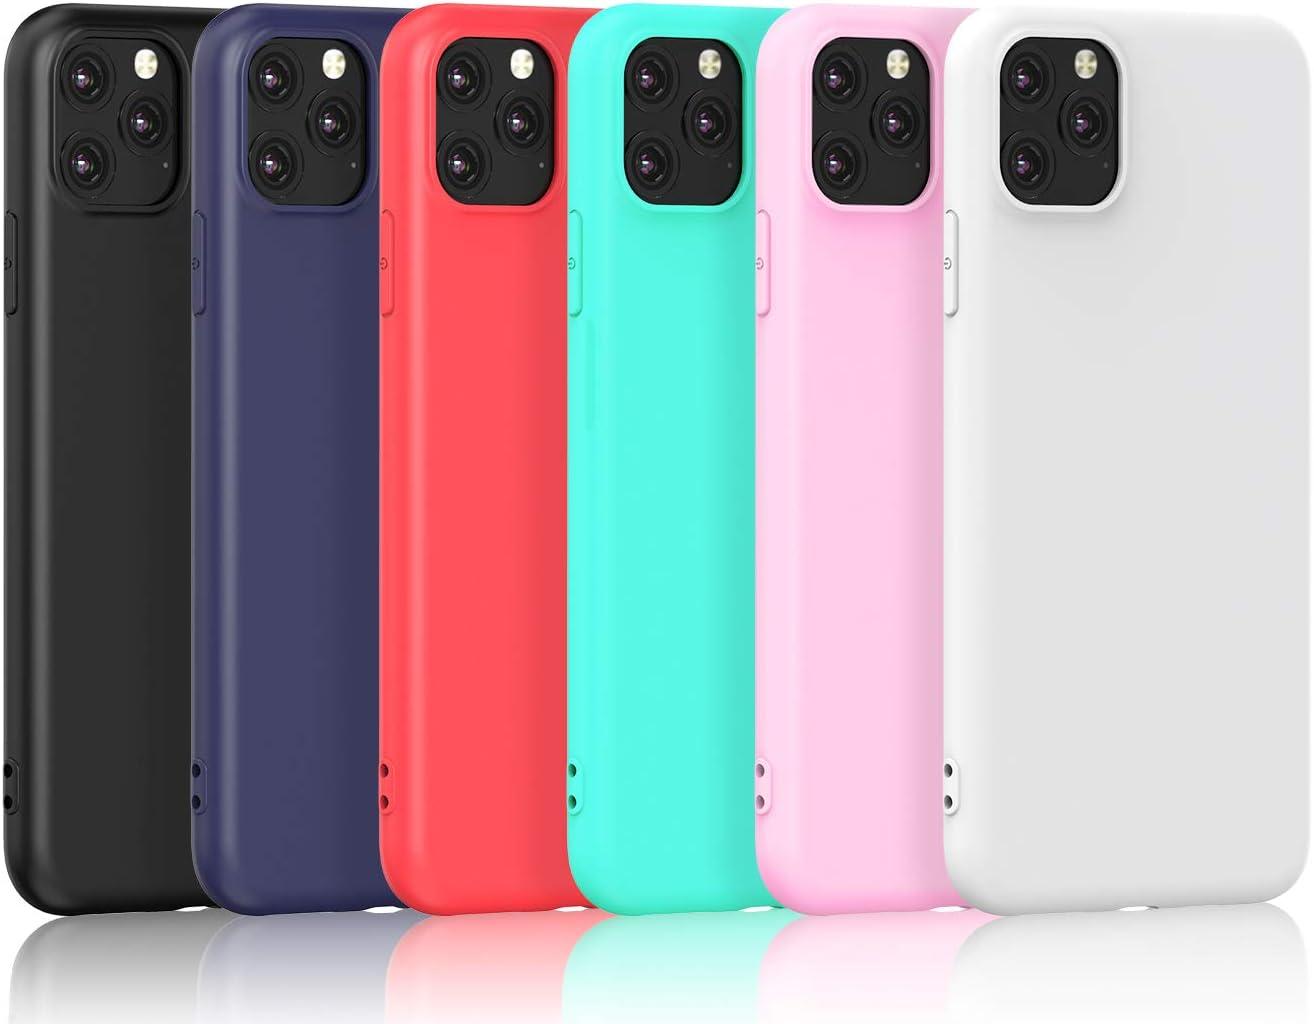 VGUARD 6 x Funda para iPhone 11 Pro 5.8 Pulgadas 2019, Ultra Fina Carcasa Silicona TPU de Alta Resistencia y Flexibilidad (Negro, Azul Oscuro, Rojo,Verde, Rosa, Transparente)